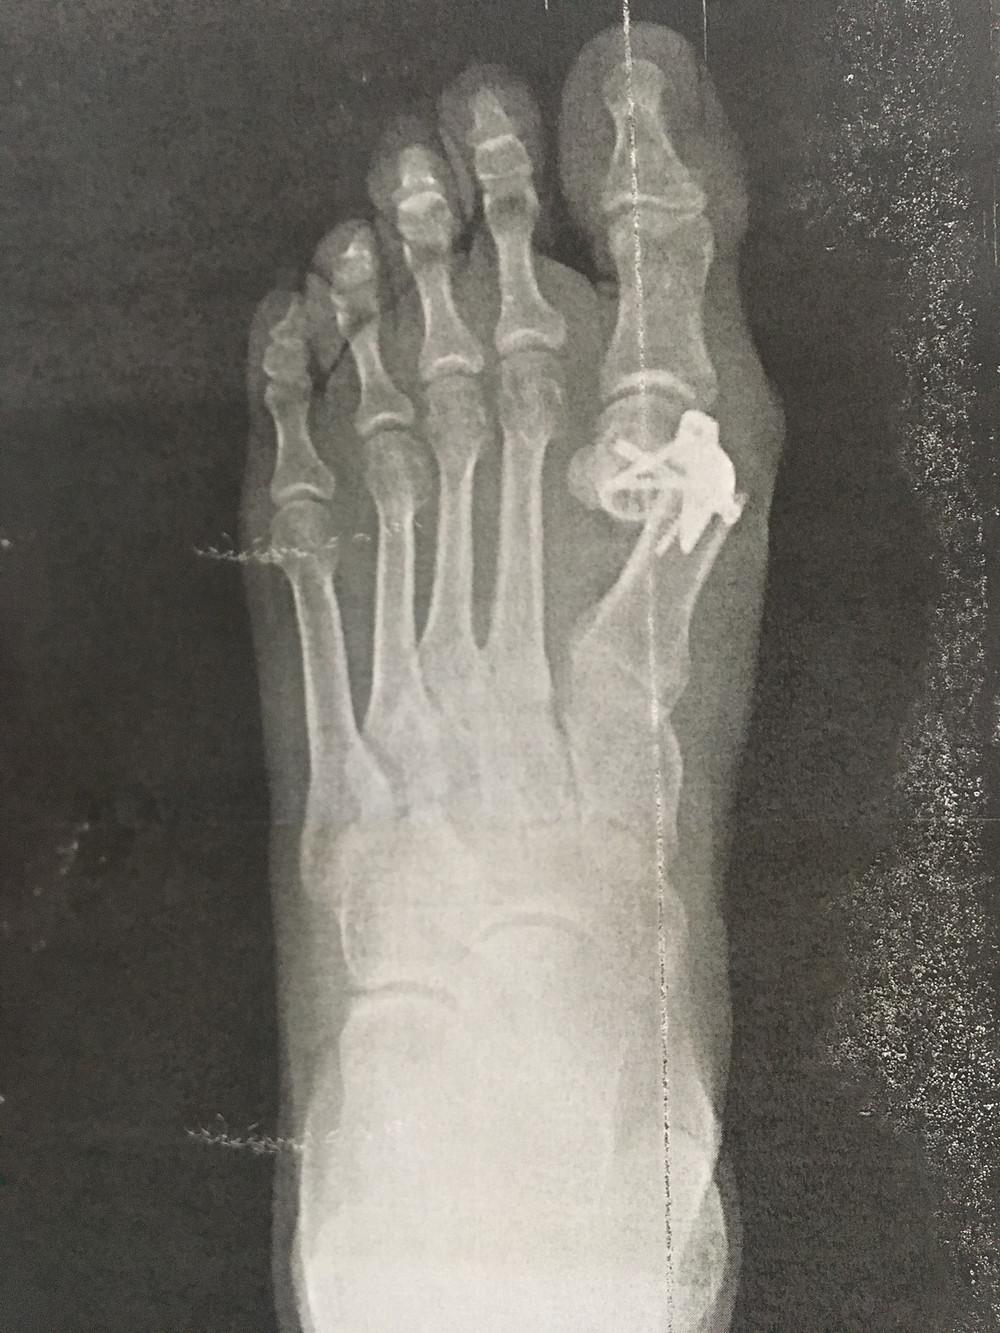 bunion surgery x-ray